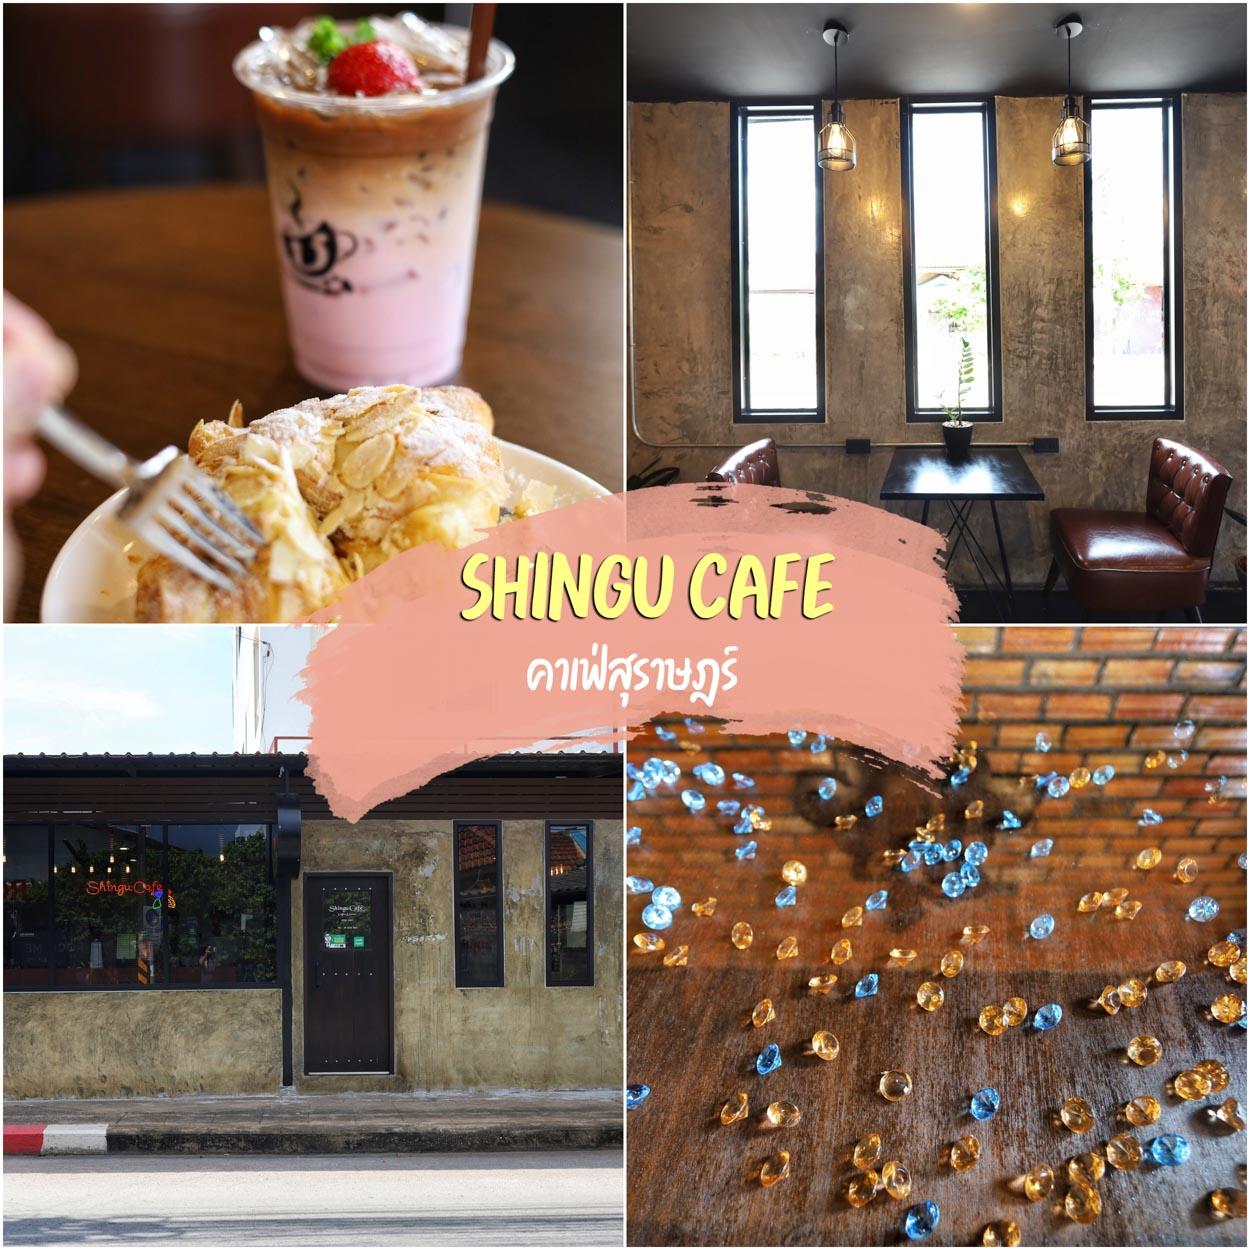 Shingucafe  ชินกู คาเฟ่  Cafe เปิดใหม่สุราษฎร์ธานี คาเฟ่ที่ไม่ได้มีแค่กาแฟ แต่ยังมีอัญมณีให้ชมอีกด้วย